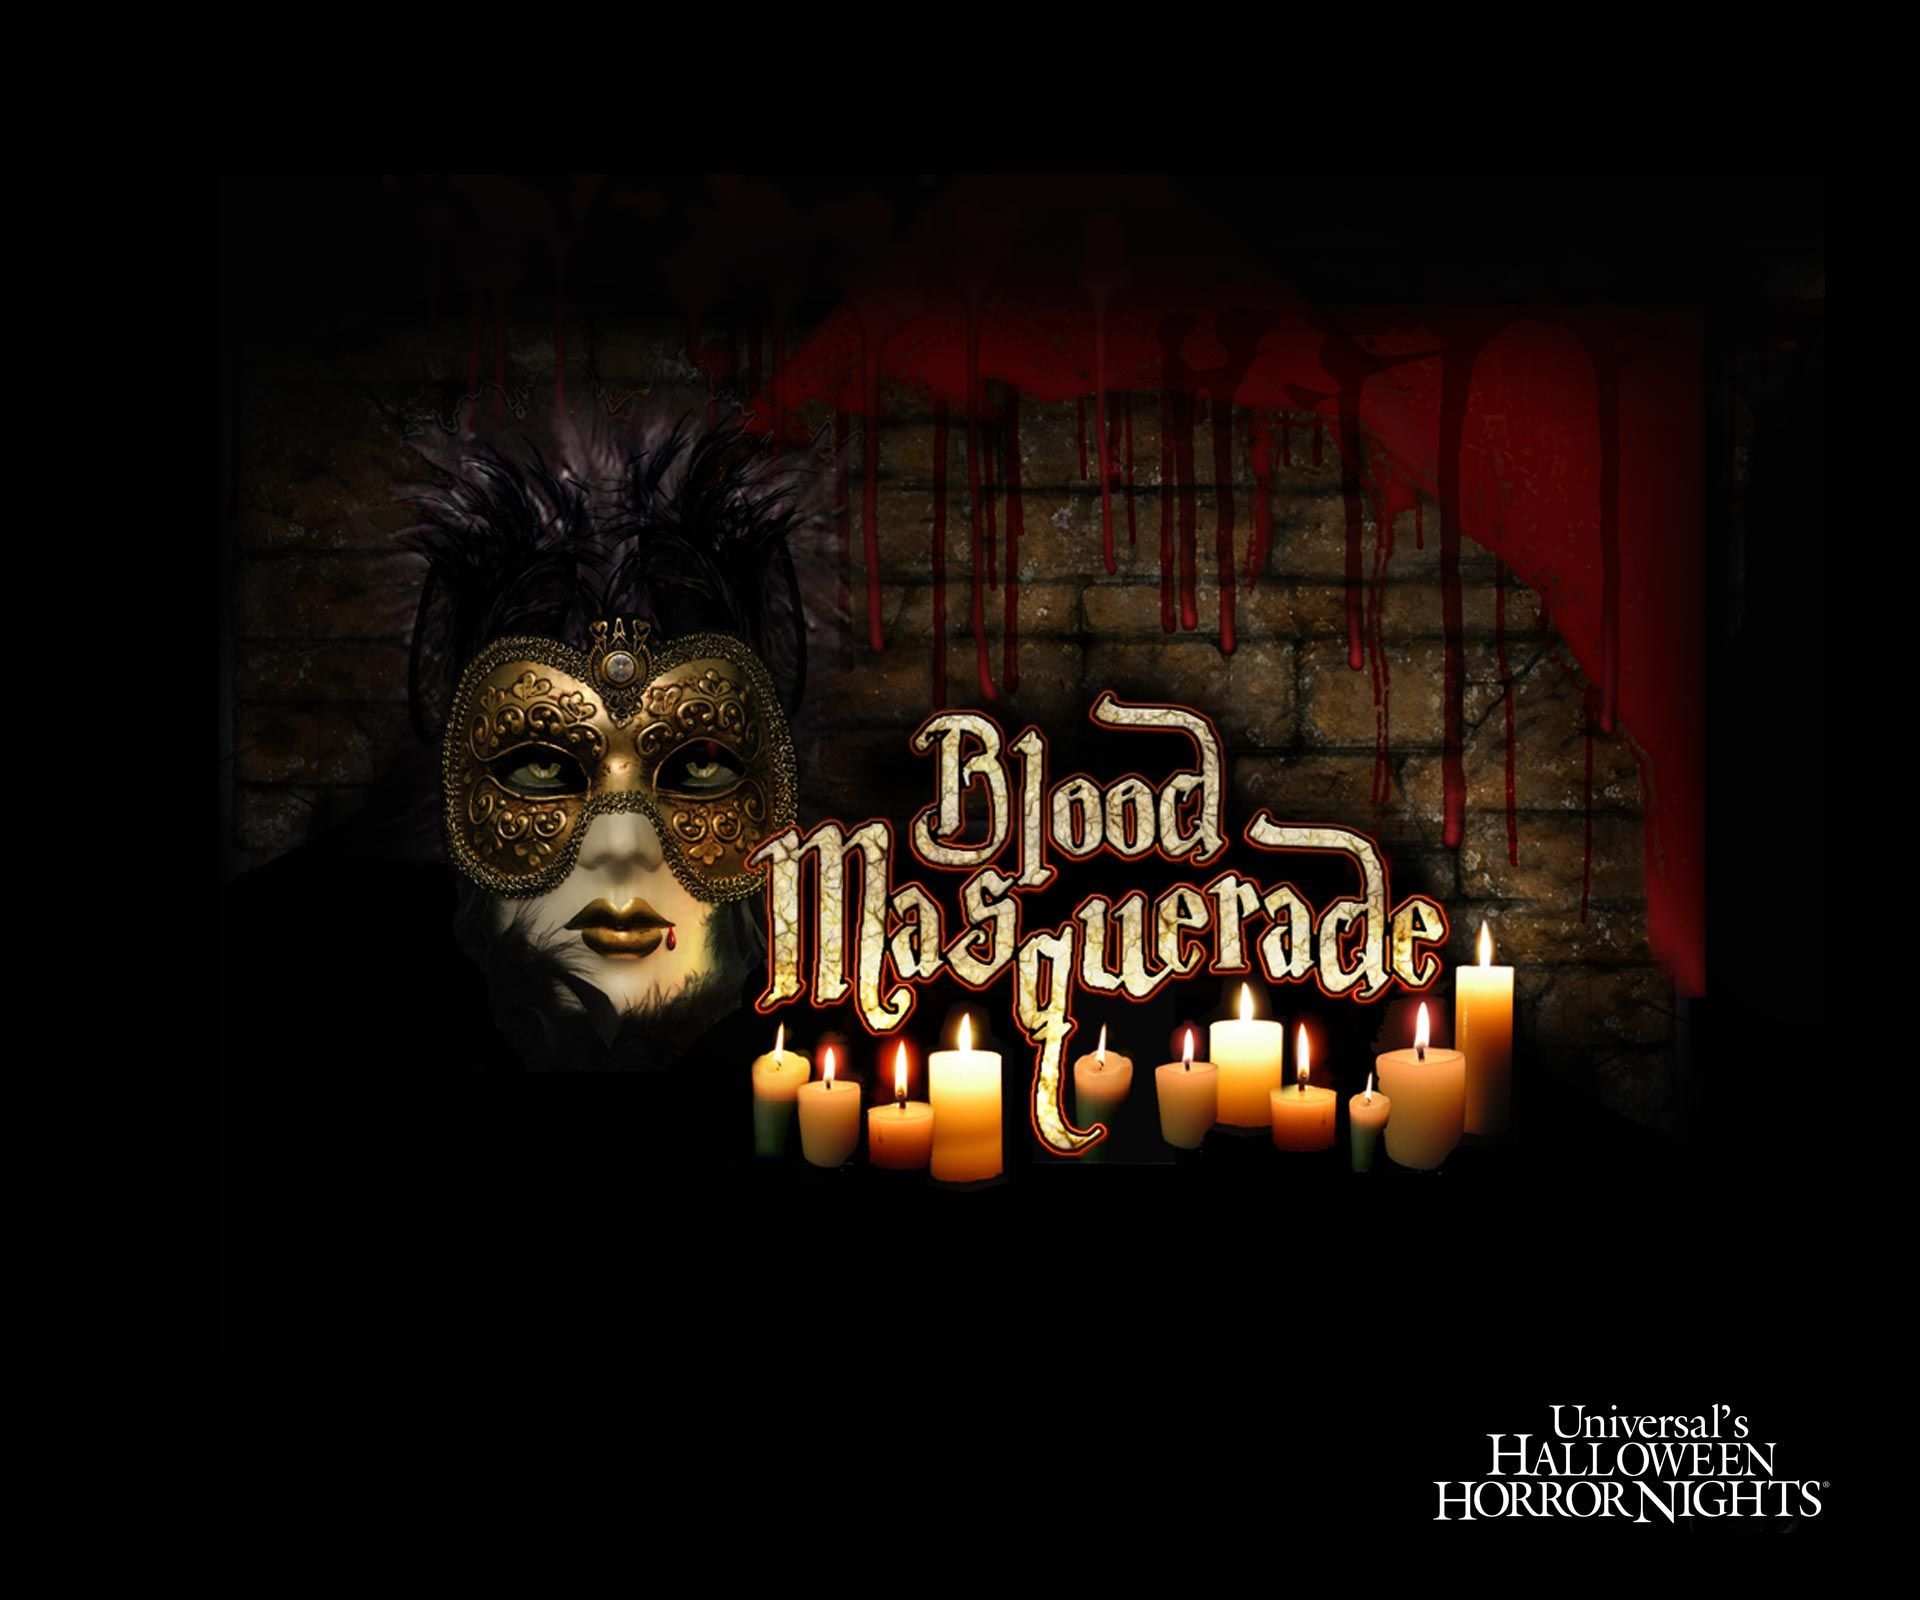 Page Not Found The Hhn Yearbook Halloween Universal Halloween Horror Nights Universal Studios Florida